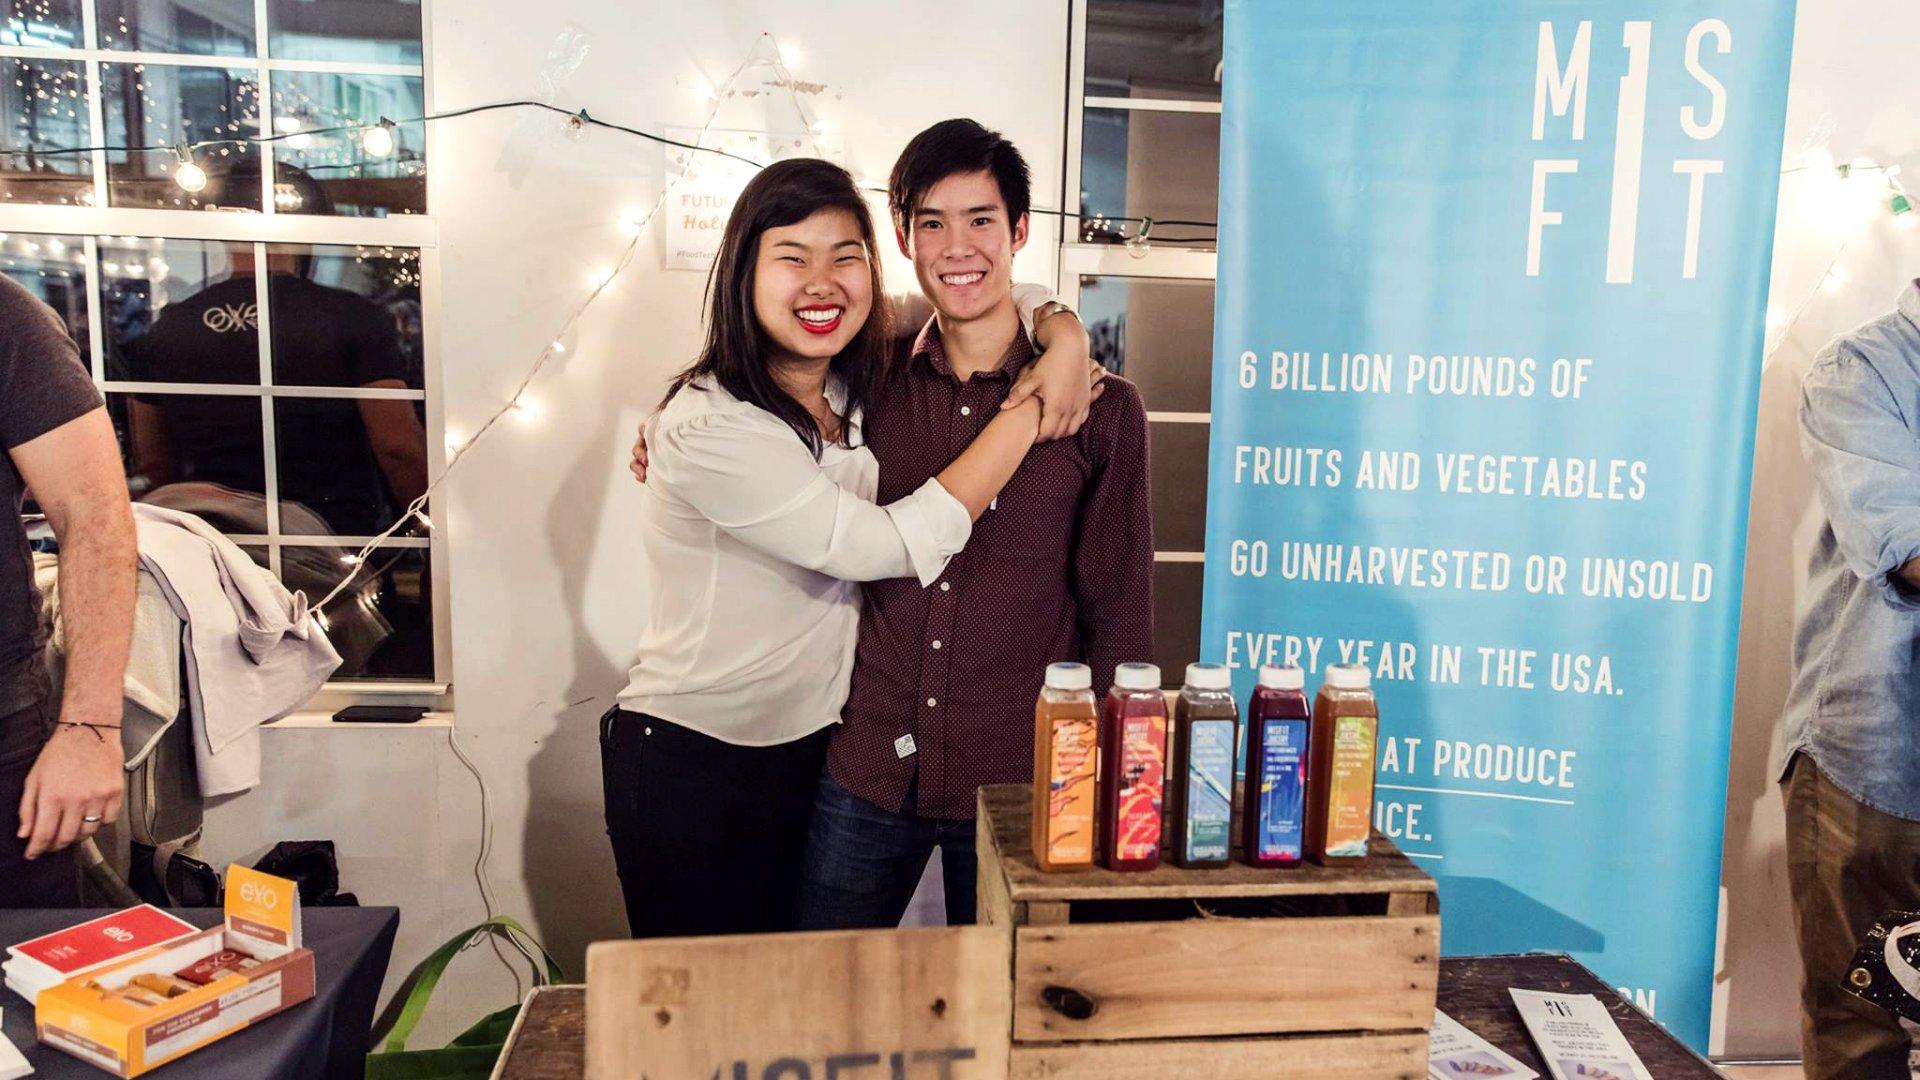 How Chobani's New Incubator Will Shake Up the Food Industry